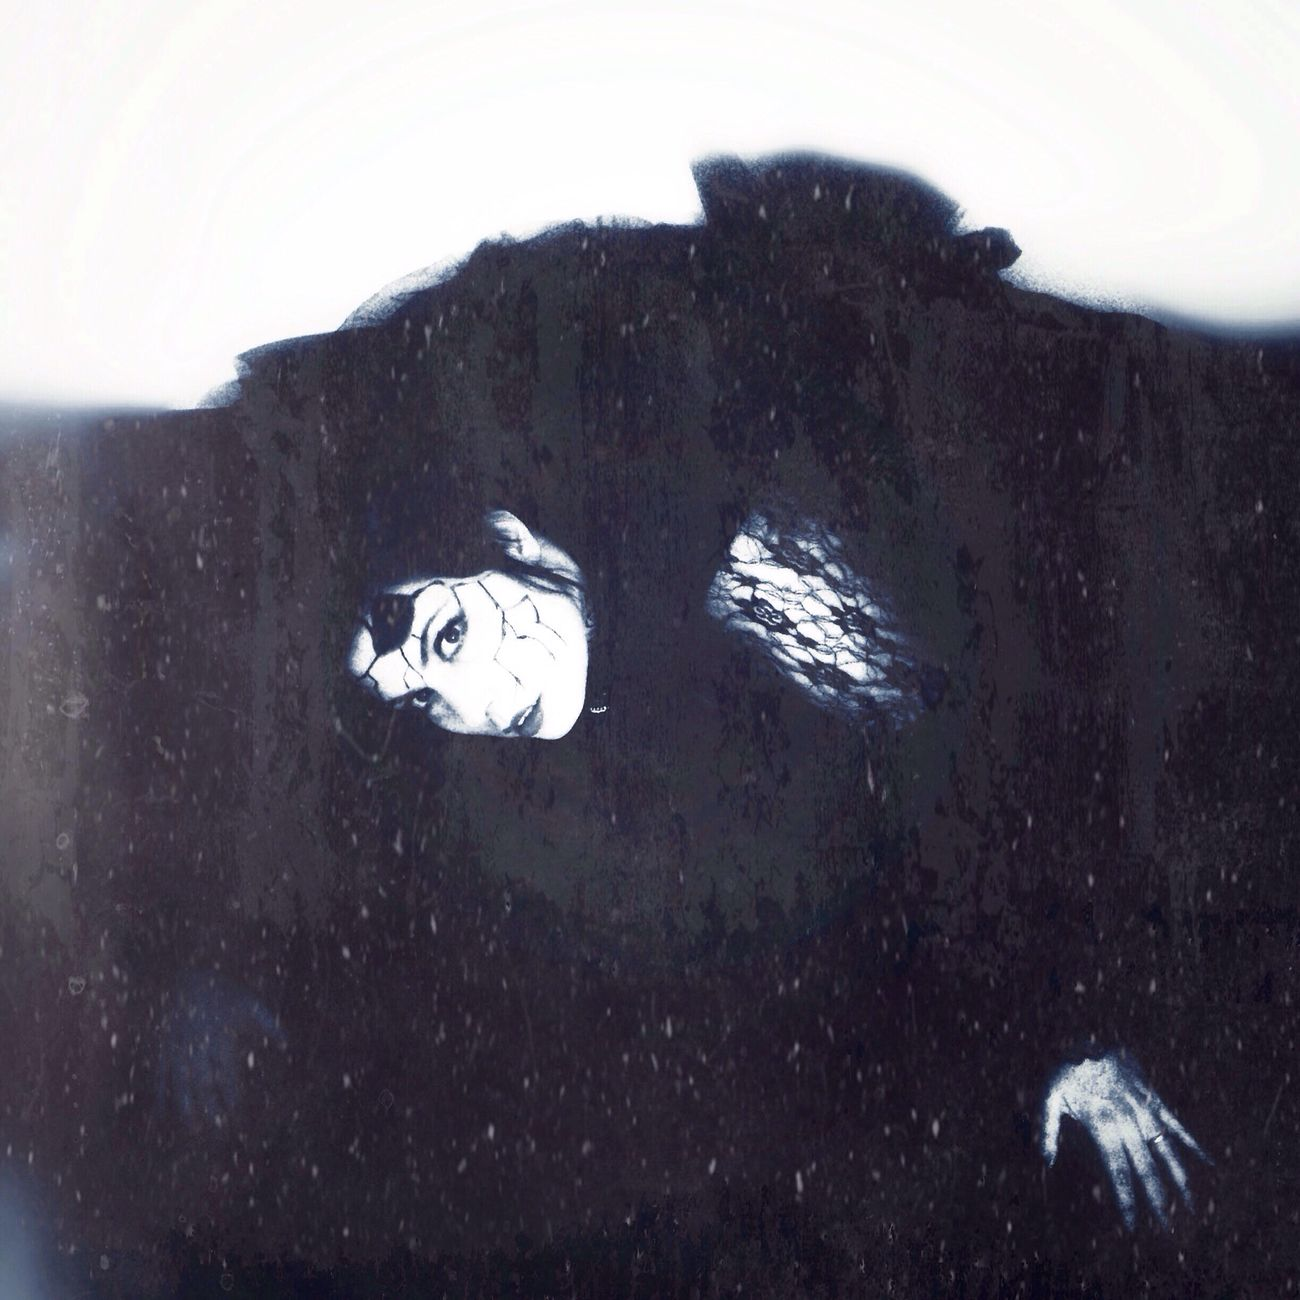 It's just a trick of the light Self Portrait Selfportrait_tuesday_nonchallenge Open Edit NEM Self Darkness Goth Dark Portrait Selfportrait Vampires And Werewolves STAY HUMAN 💯 Dark Art Black & White Monochrome